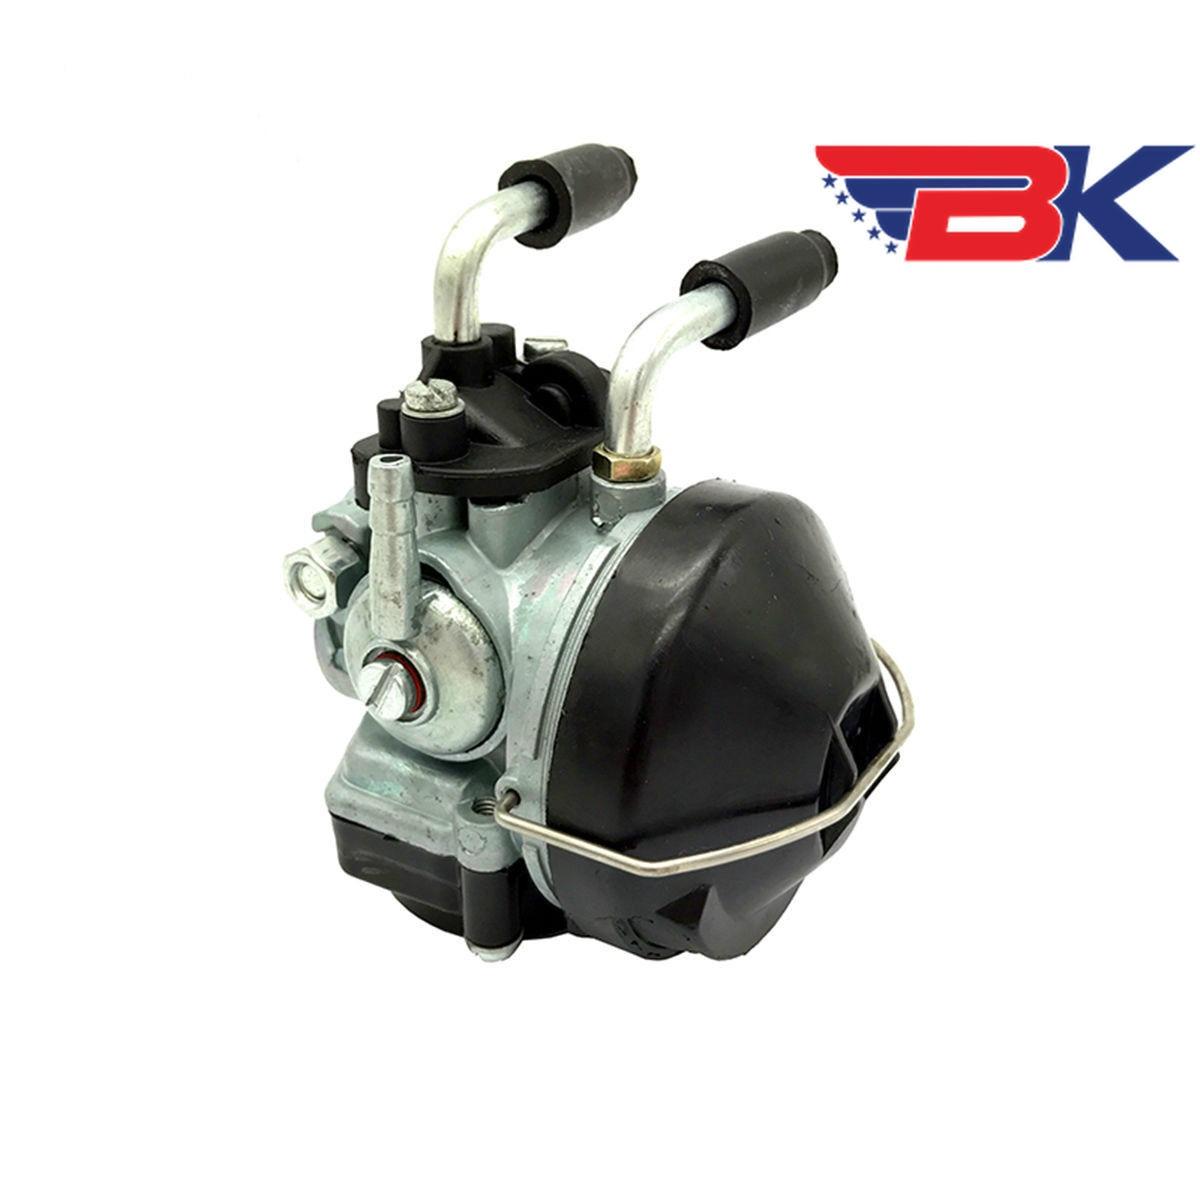 Carburetor For POLINI 19 PHBG 19mm MBK 51 PEUGEOT 103 DELLORTO Carb NEUF